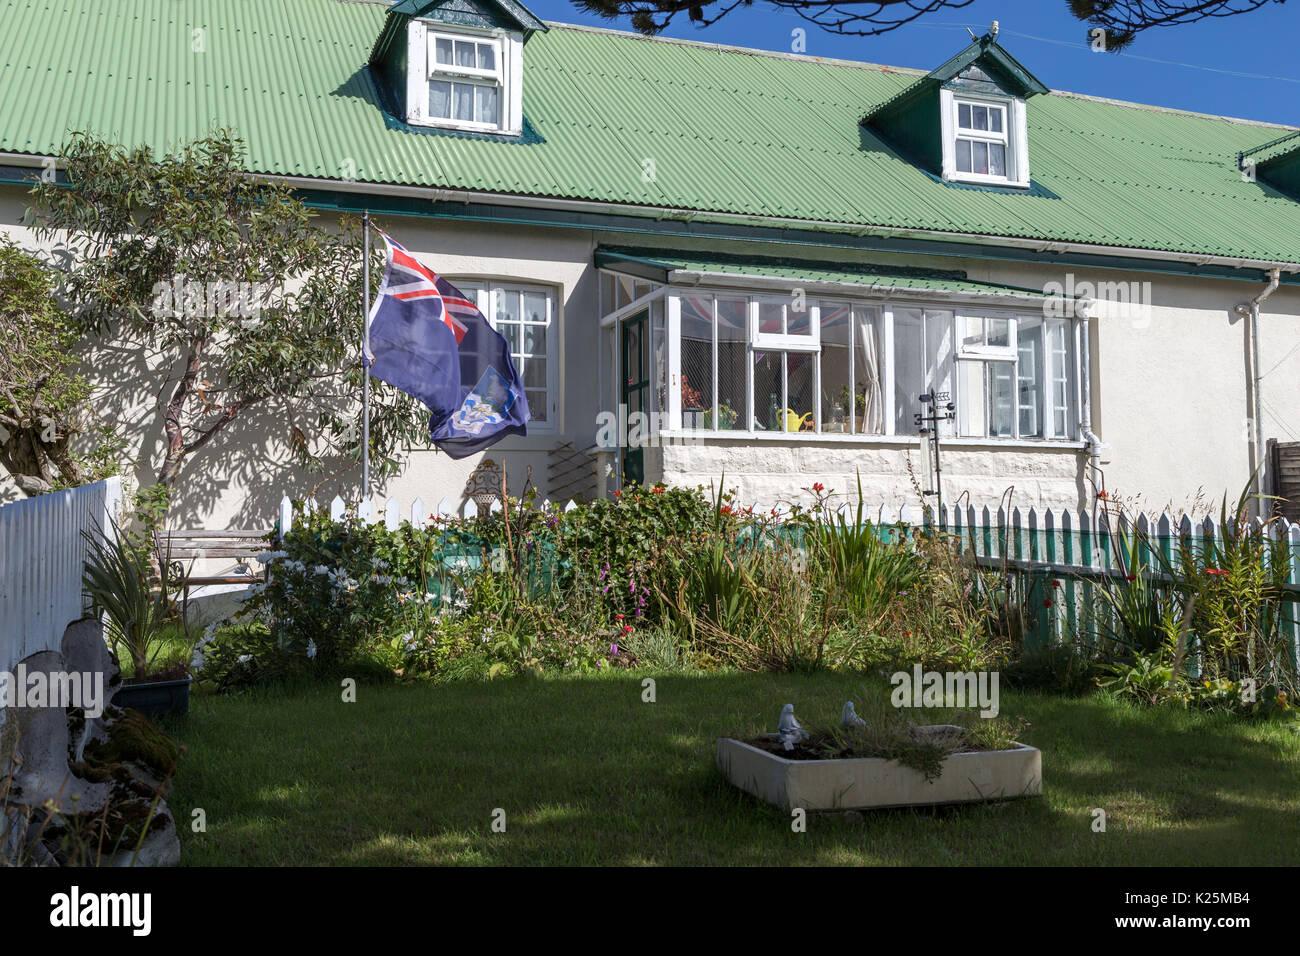 Patriotism and traditional homes  Ross Road (main street) Stanley Falkland Island (Malvinas) - Stock Image